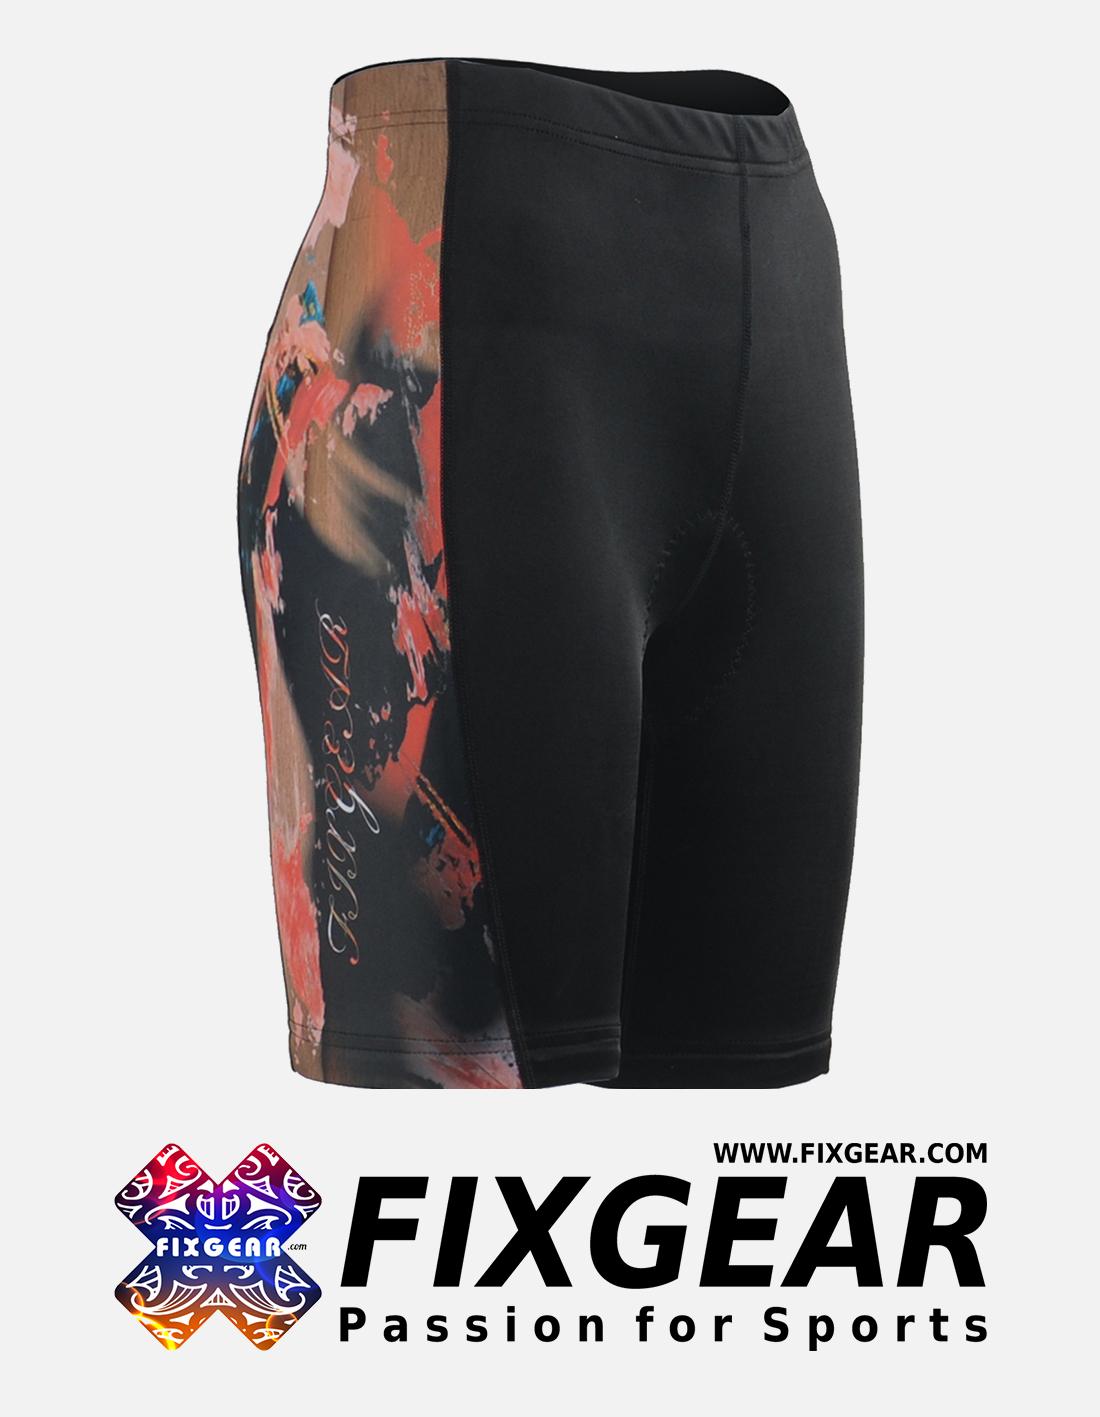 FIXGEAR ST-WJ1 Women's Cycling Padded Shorts